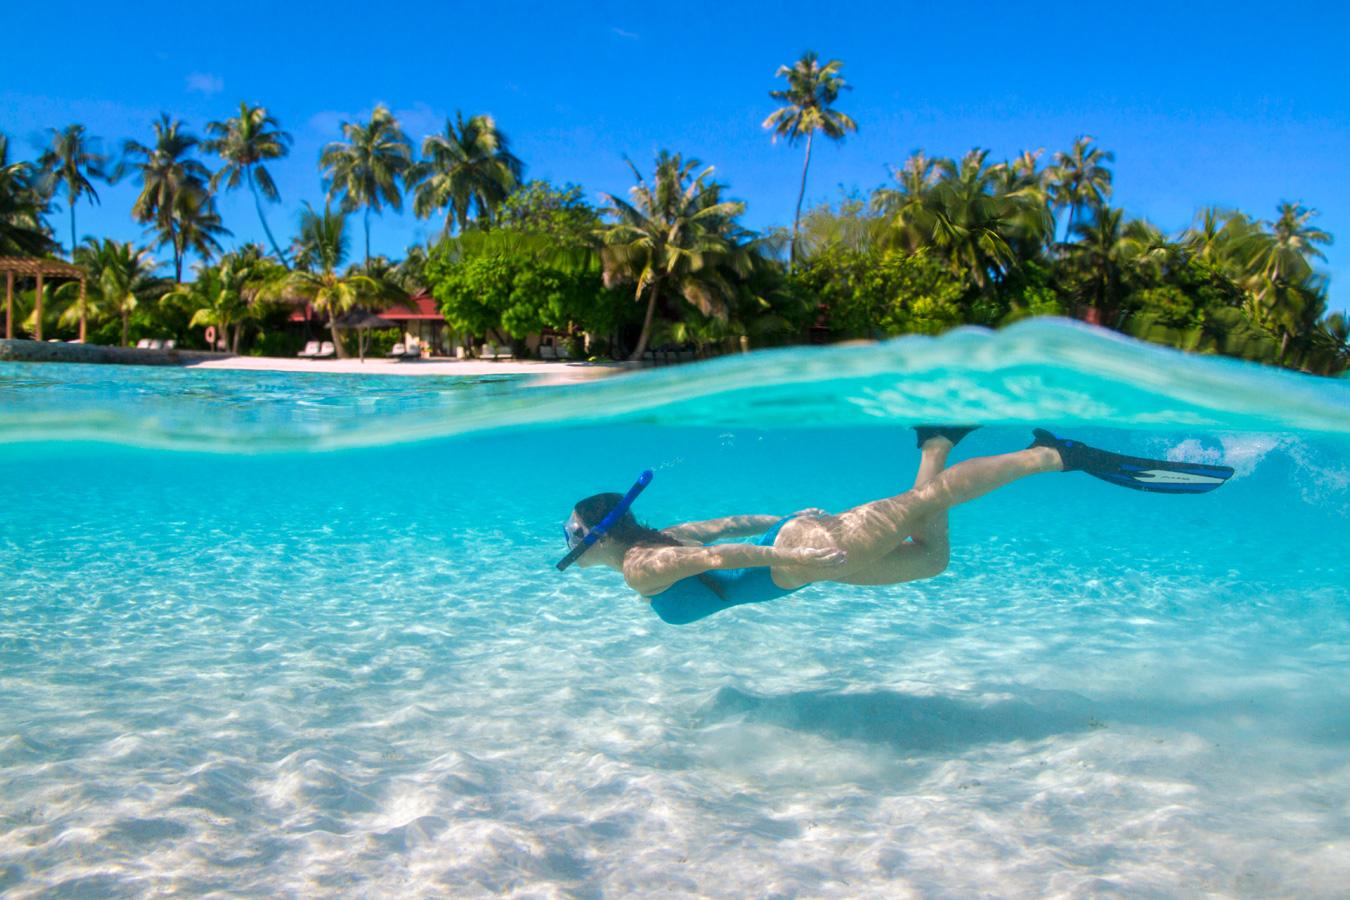 Snorkelling in Maldives